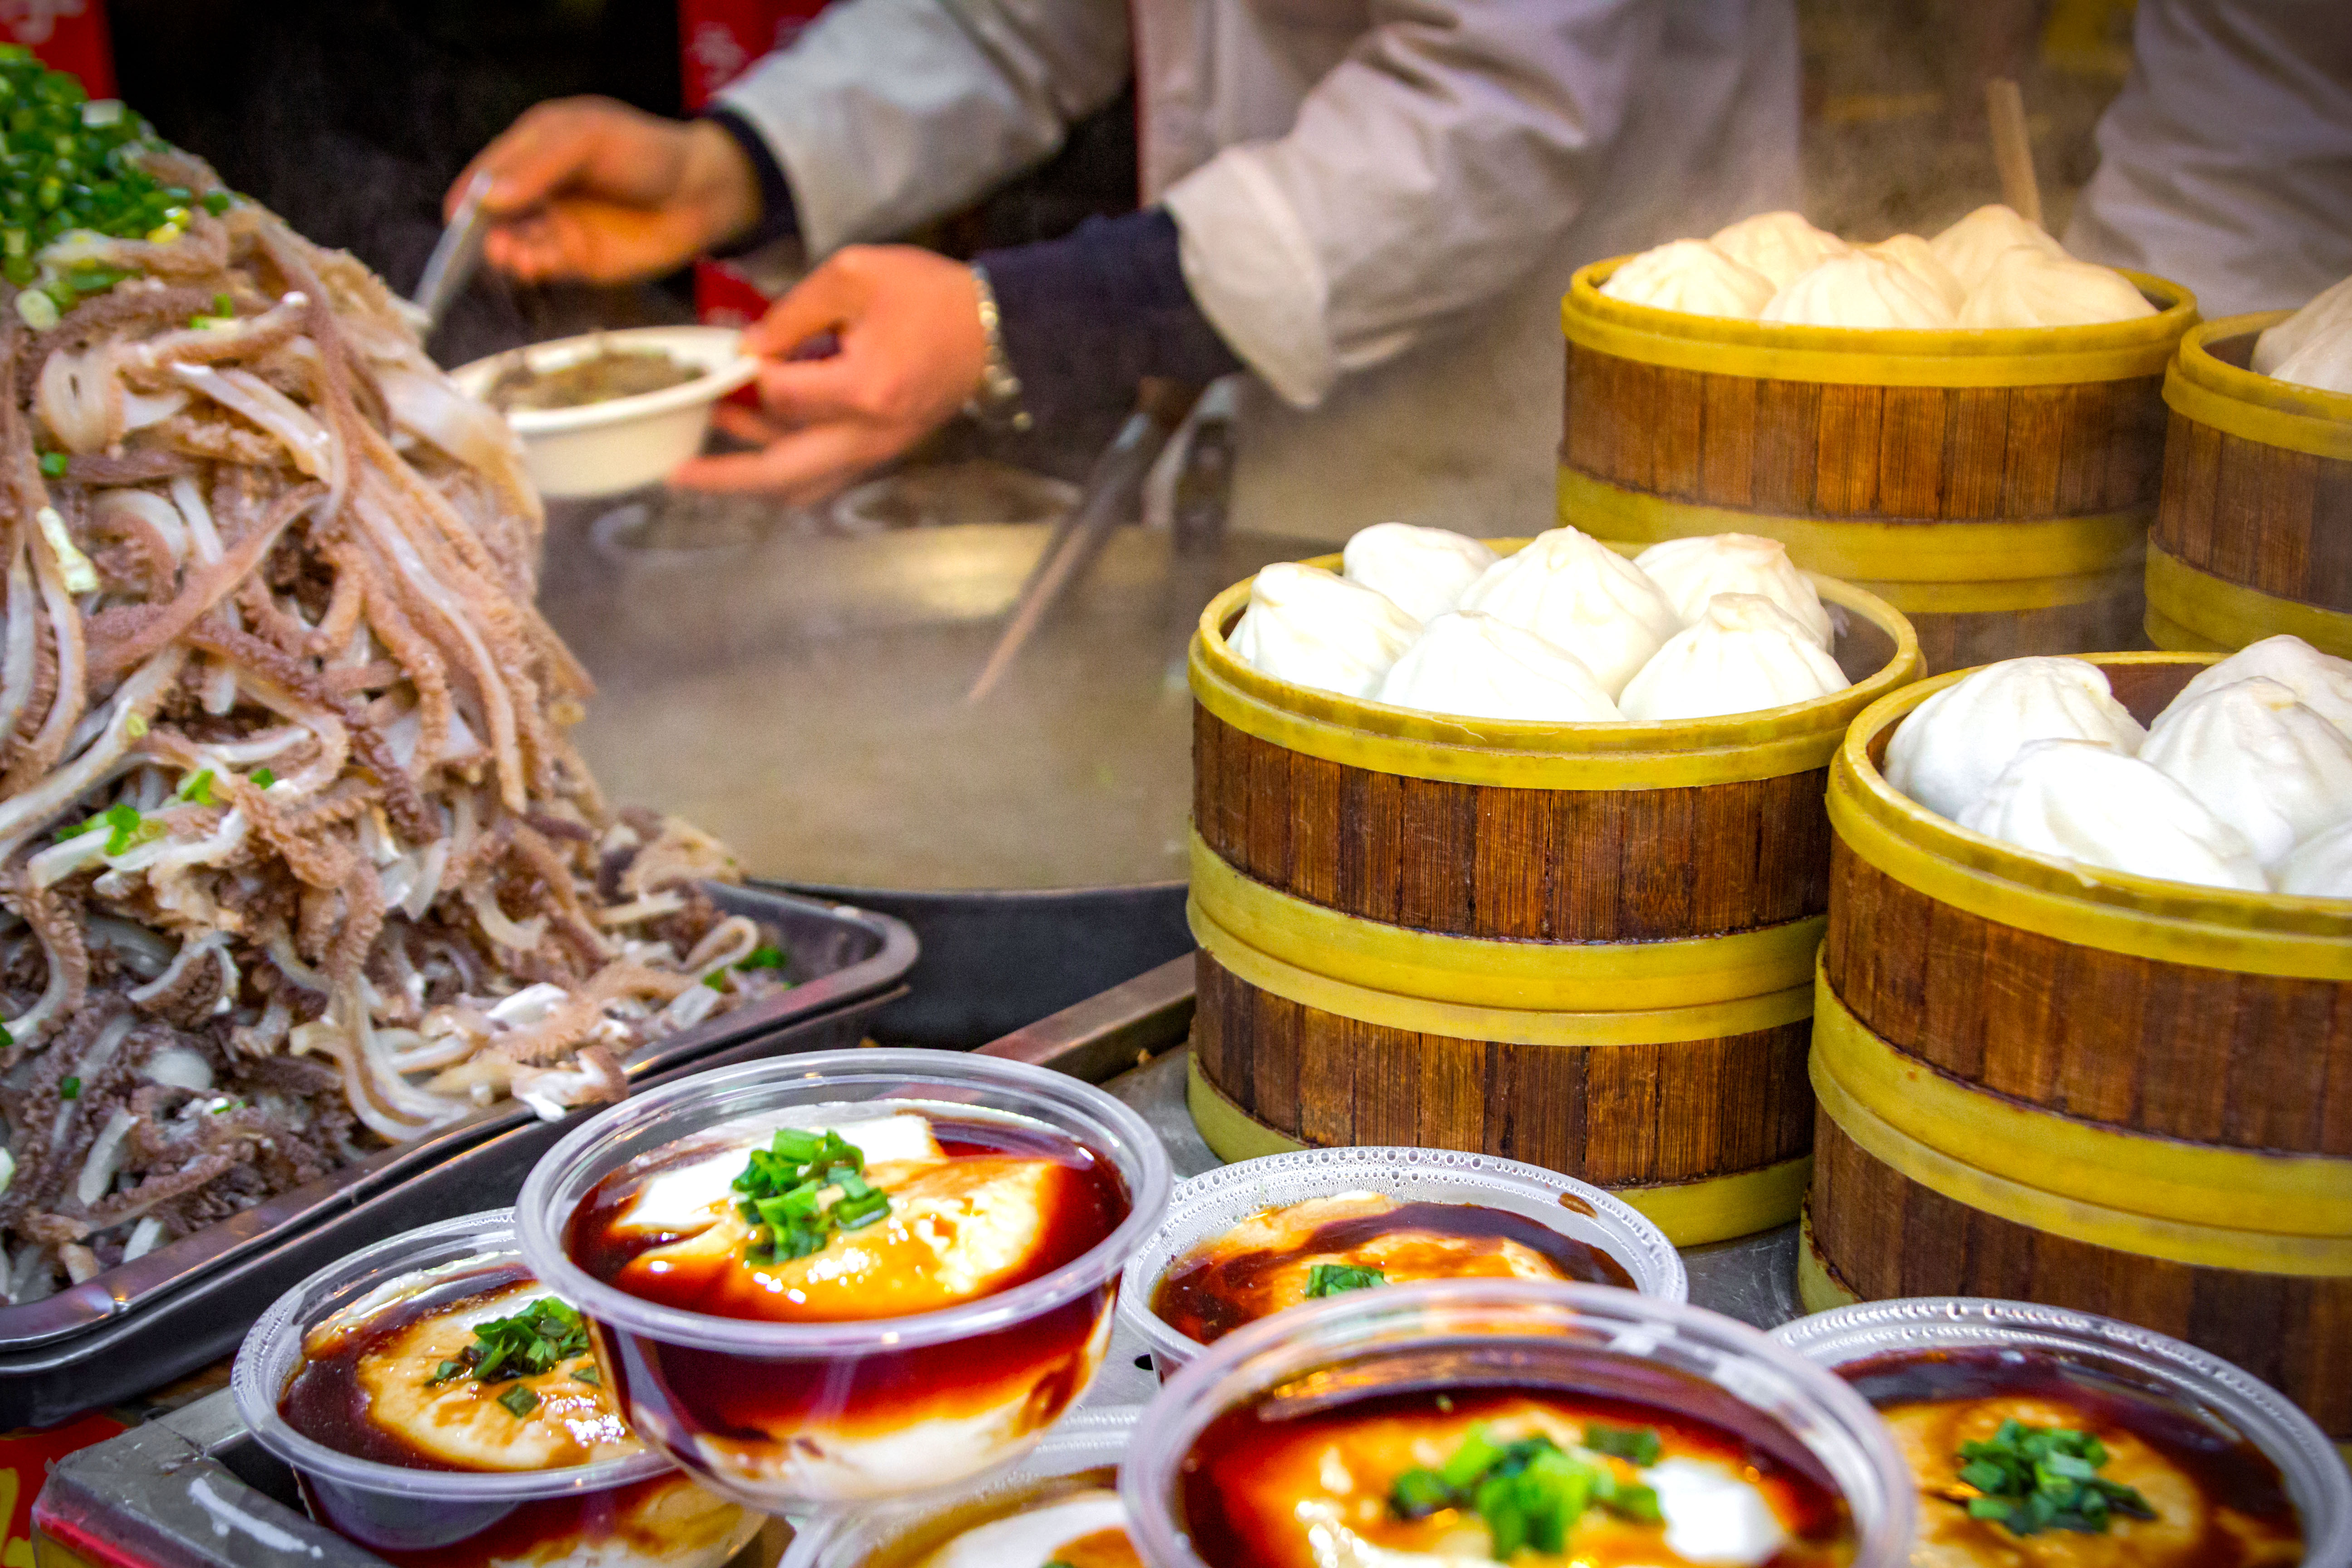 Descubre la verdadera gastronomía china - China Gran Viaje China clásica: Beijing, Xi'an y Shanghai